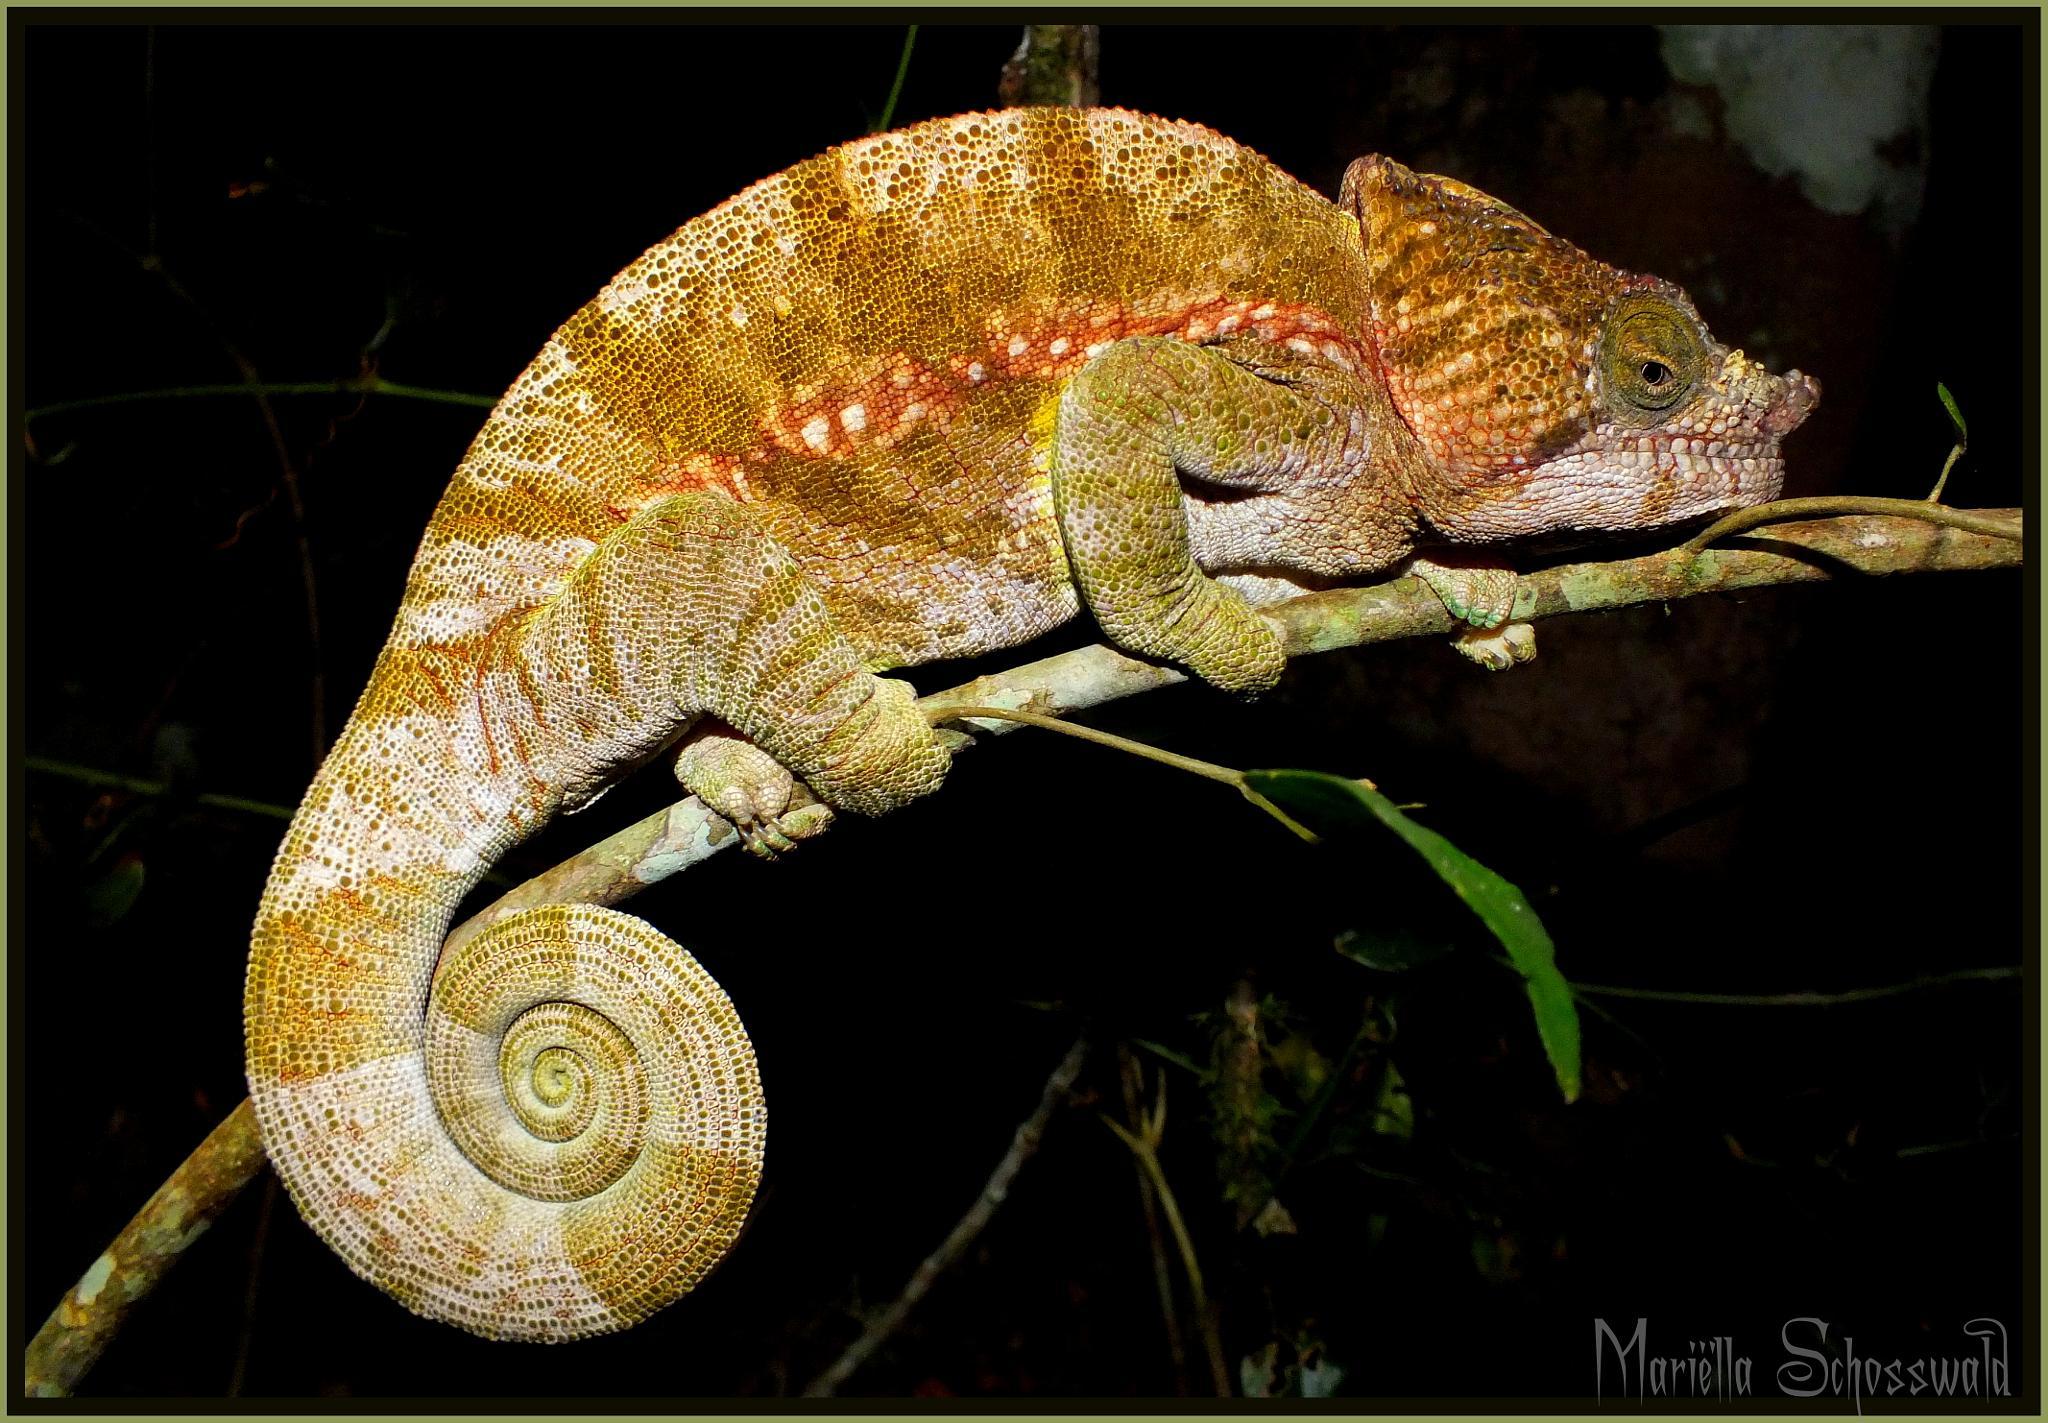 chameleon by Mariëlla van der Lans-Schosswald